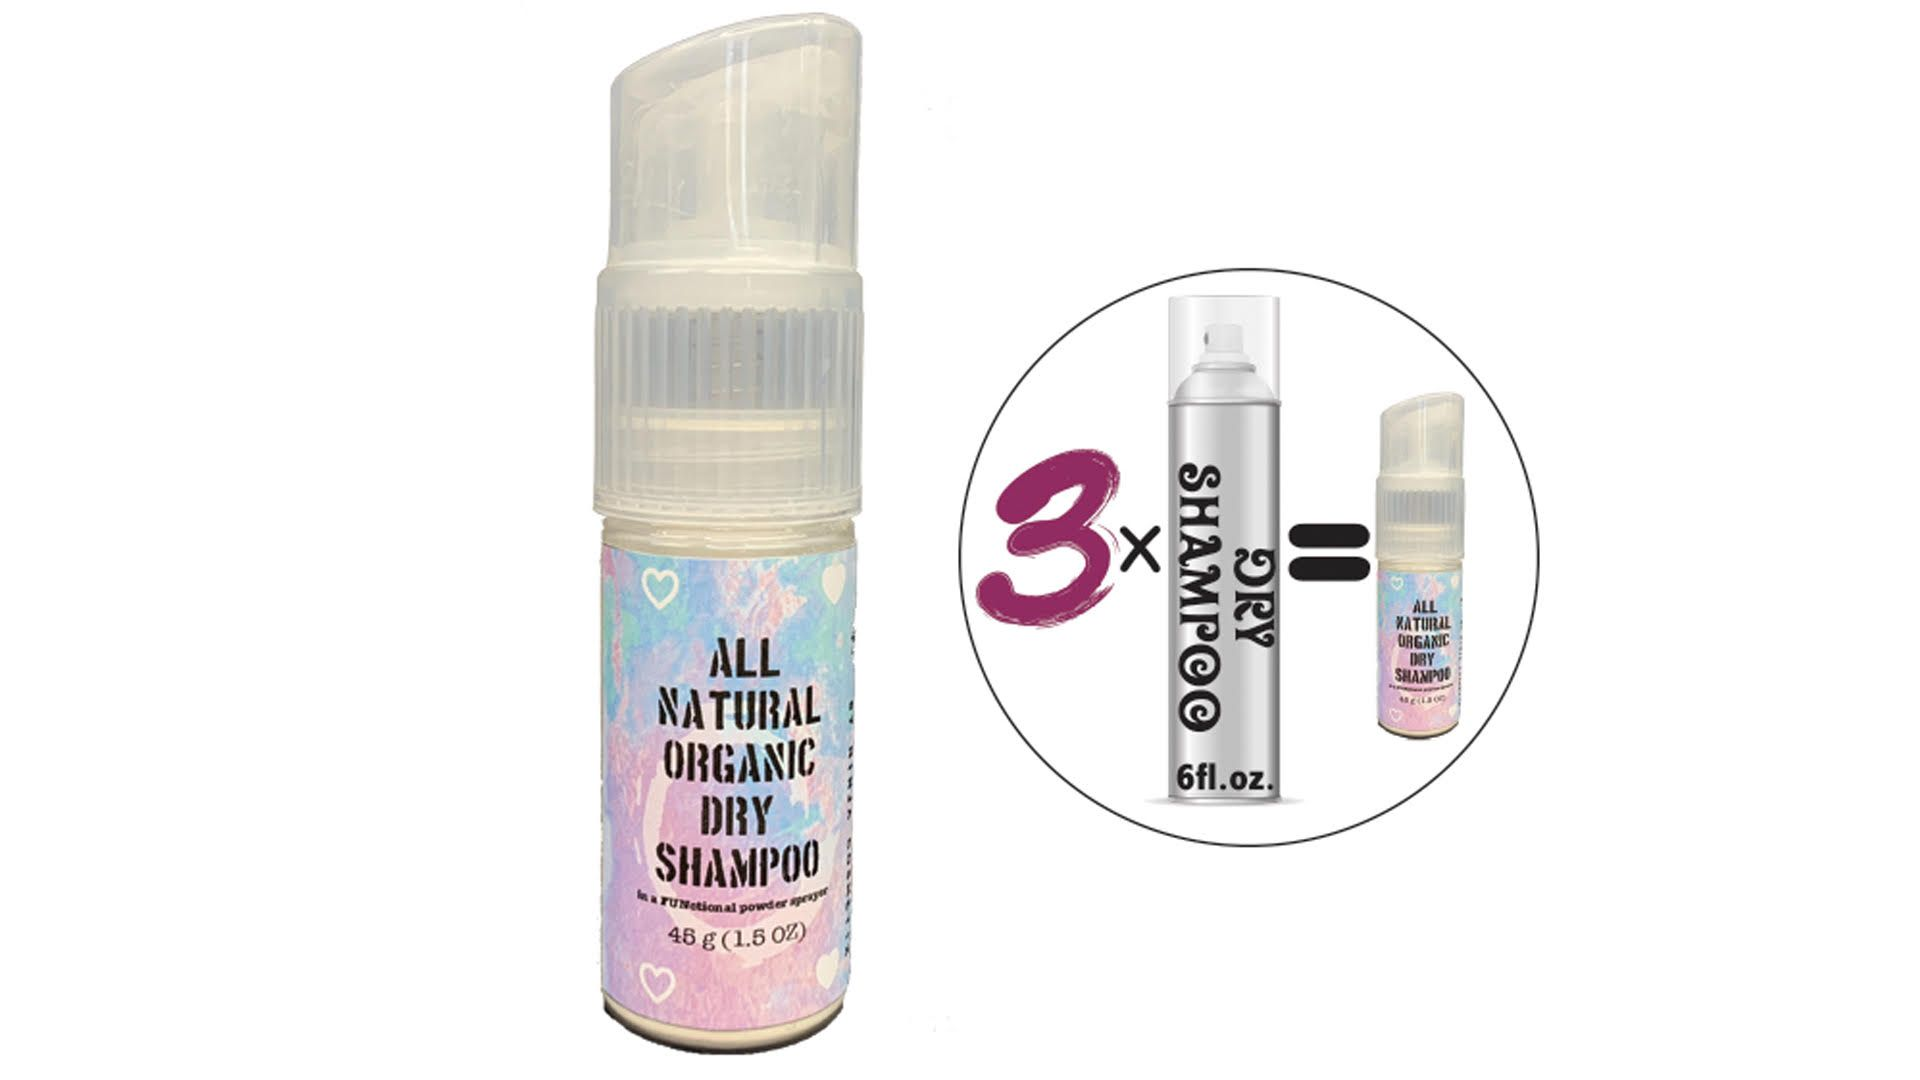 Ninja Cosmetix Awake All Natural Organic Dry Shampoo Shopkula Organic Dry Shampoo Dry Shampoo Shampoo